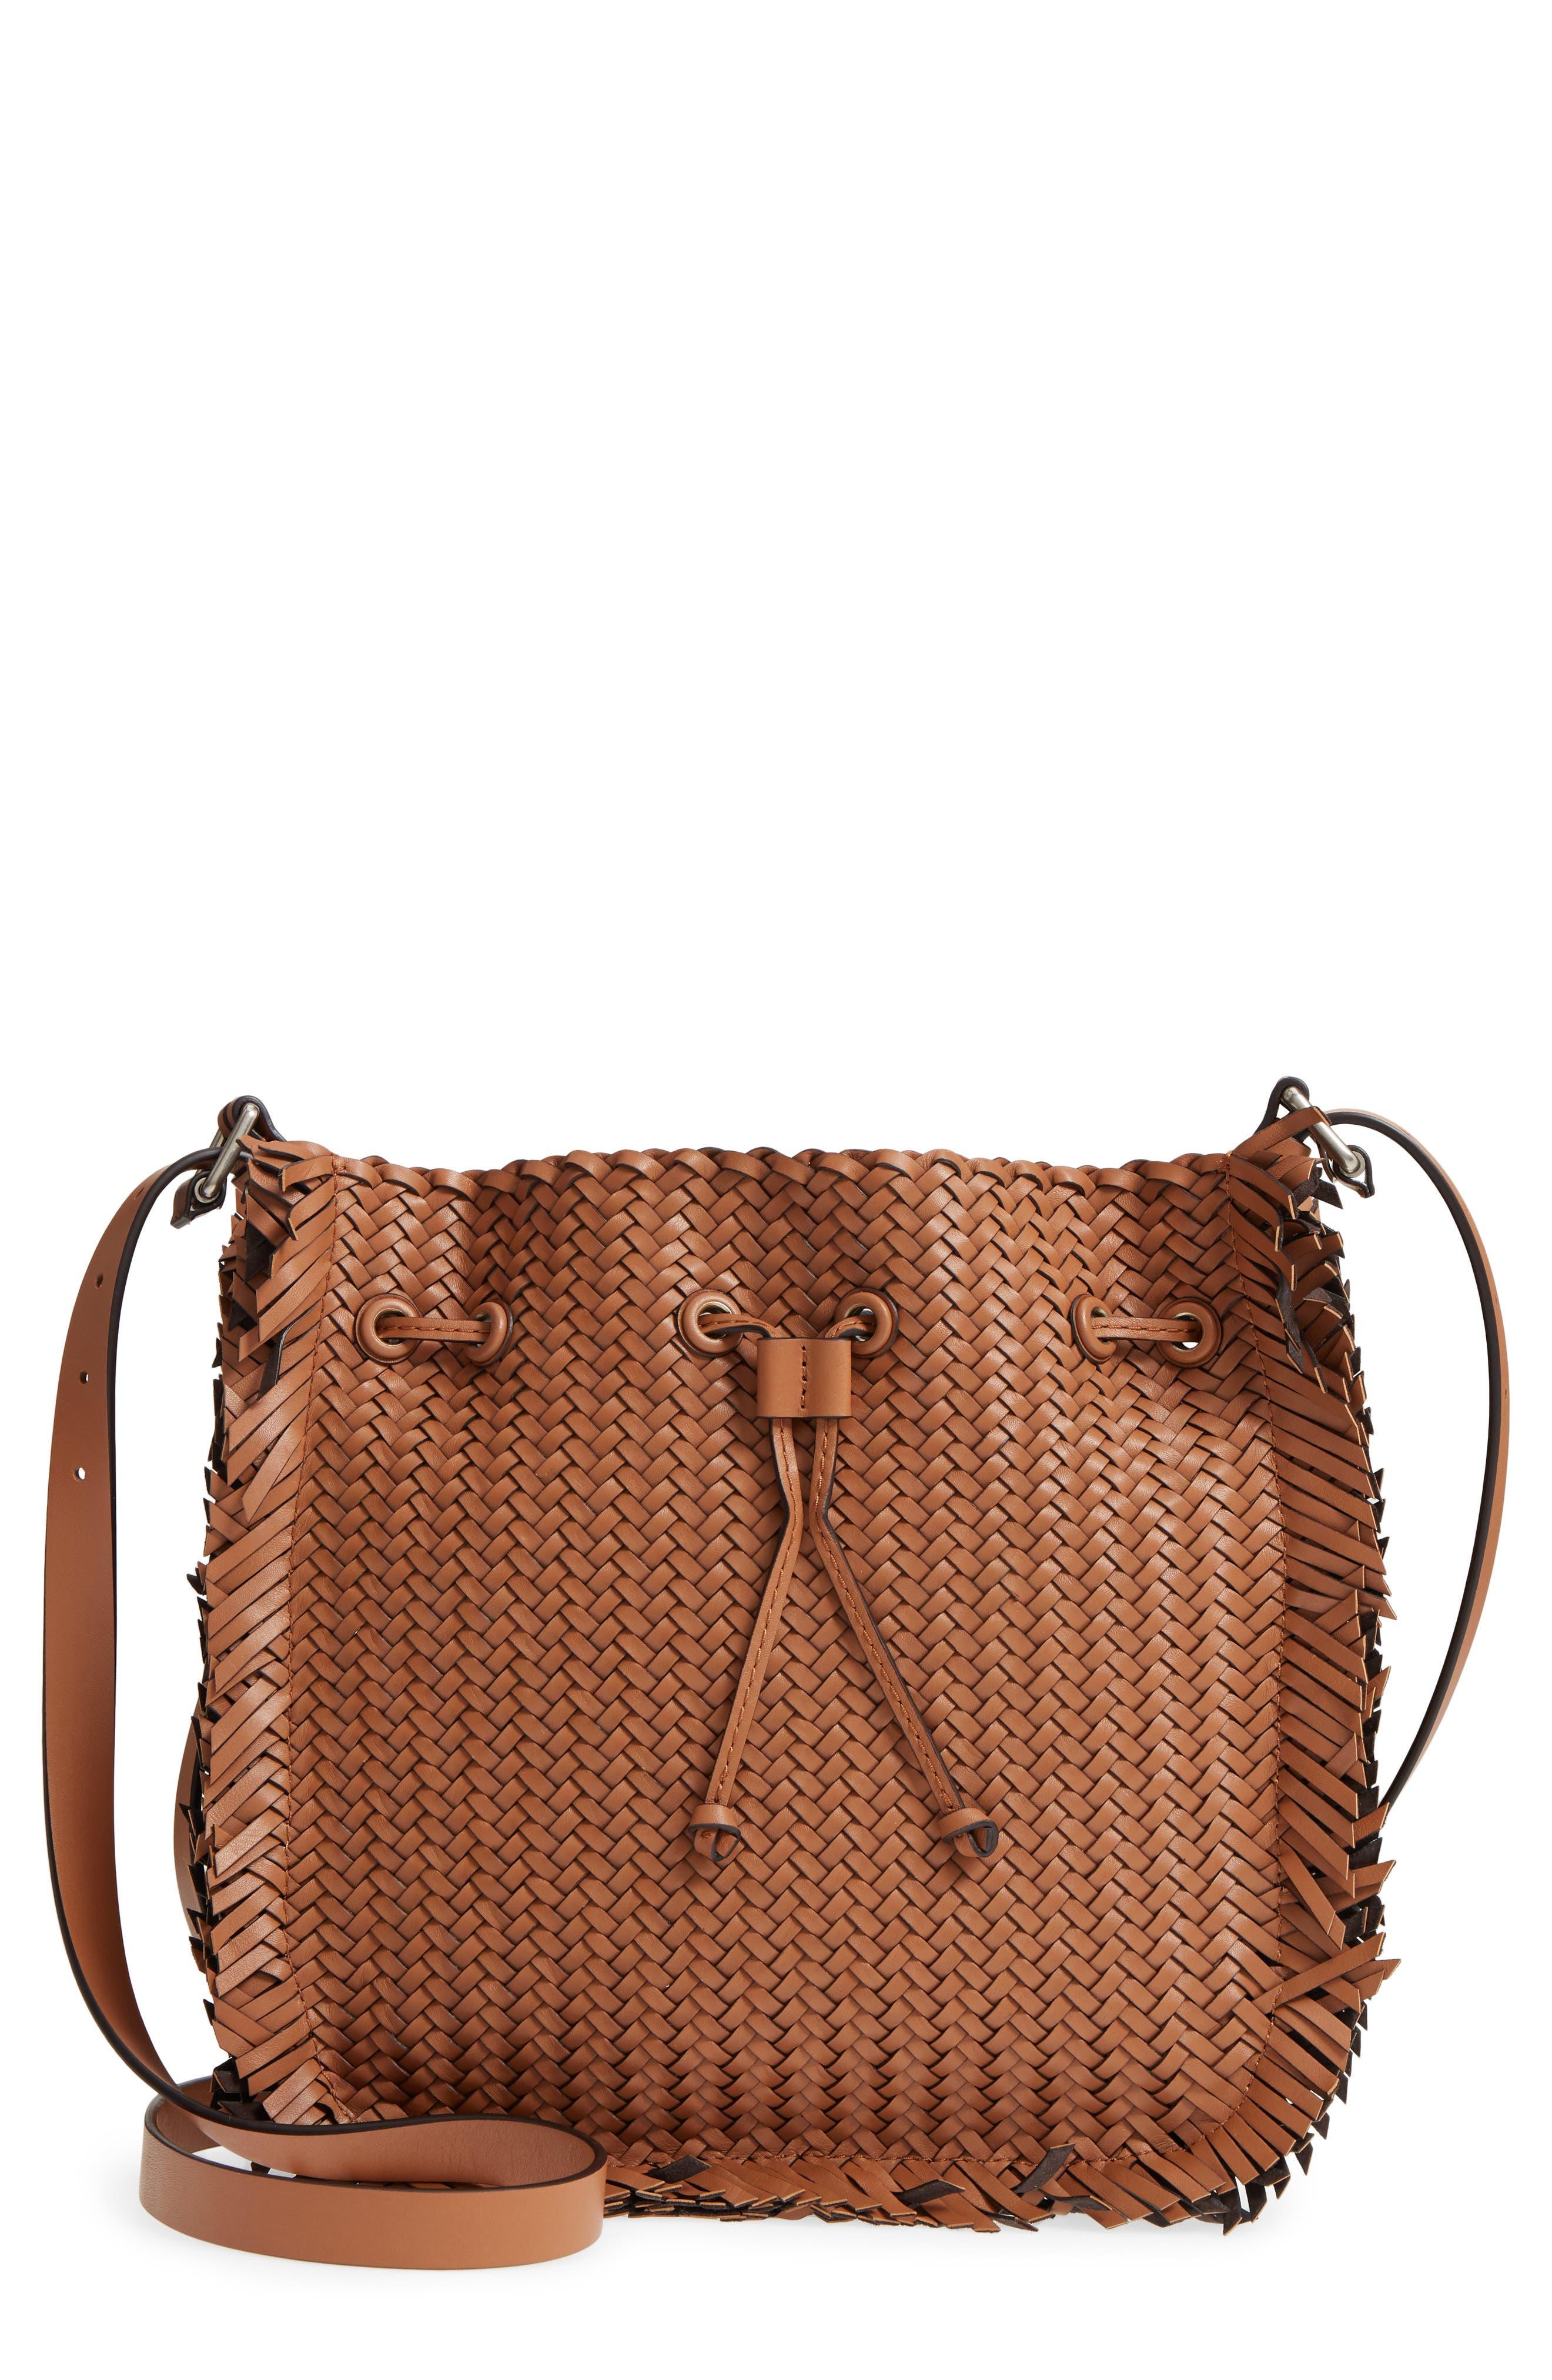 Maldives Woven Frayed Leather Crossbody Bag,                             Main thumbnail 1, color,                             231